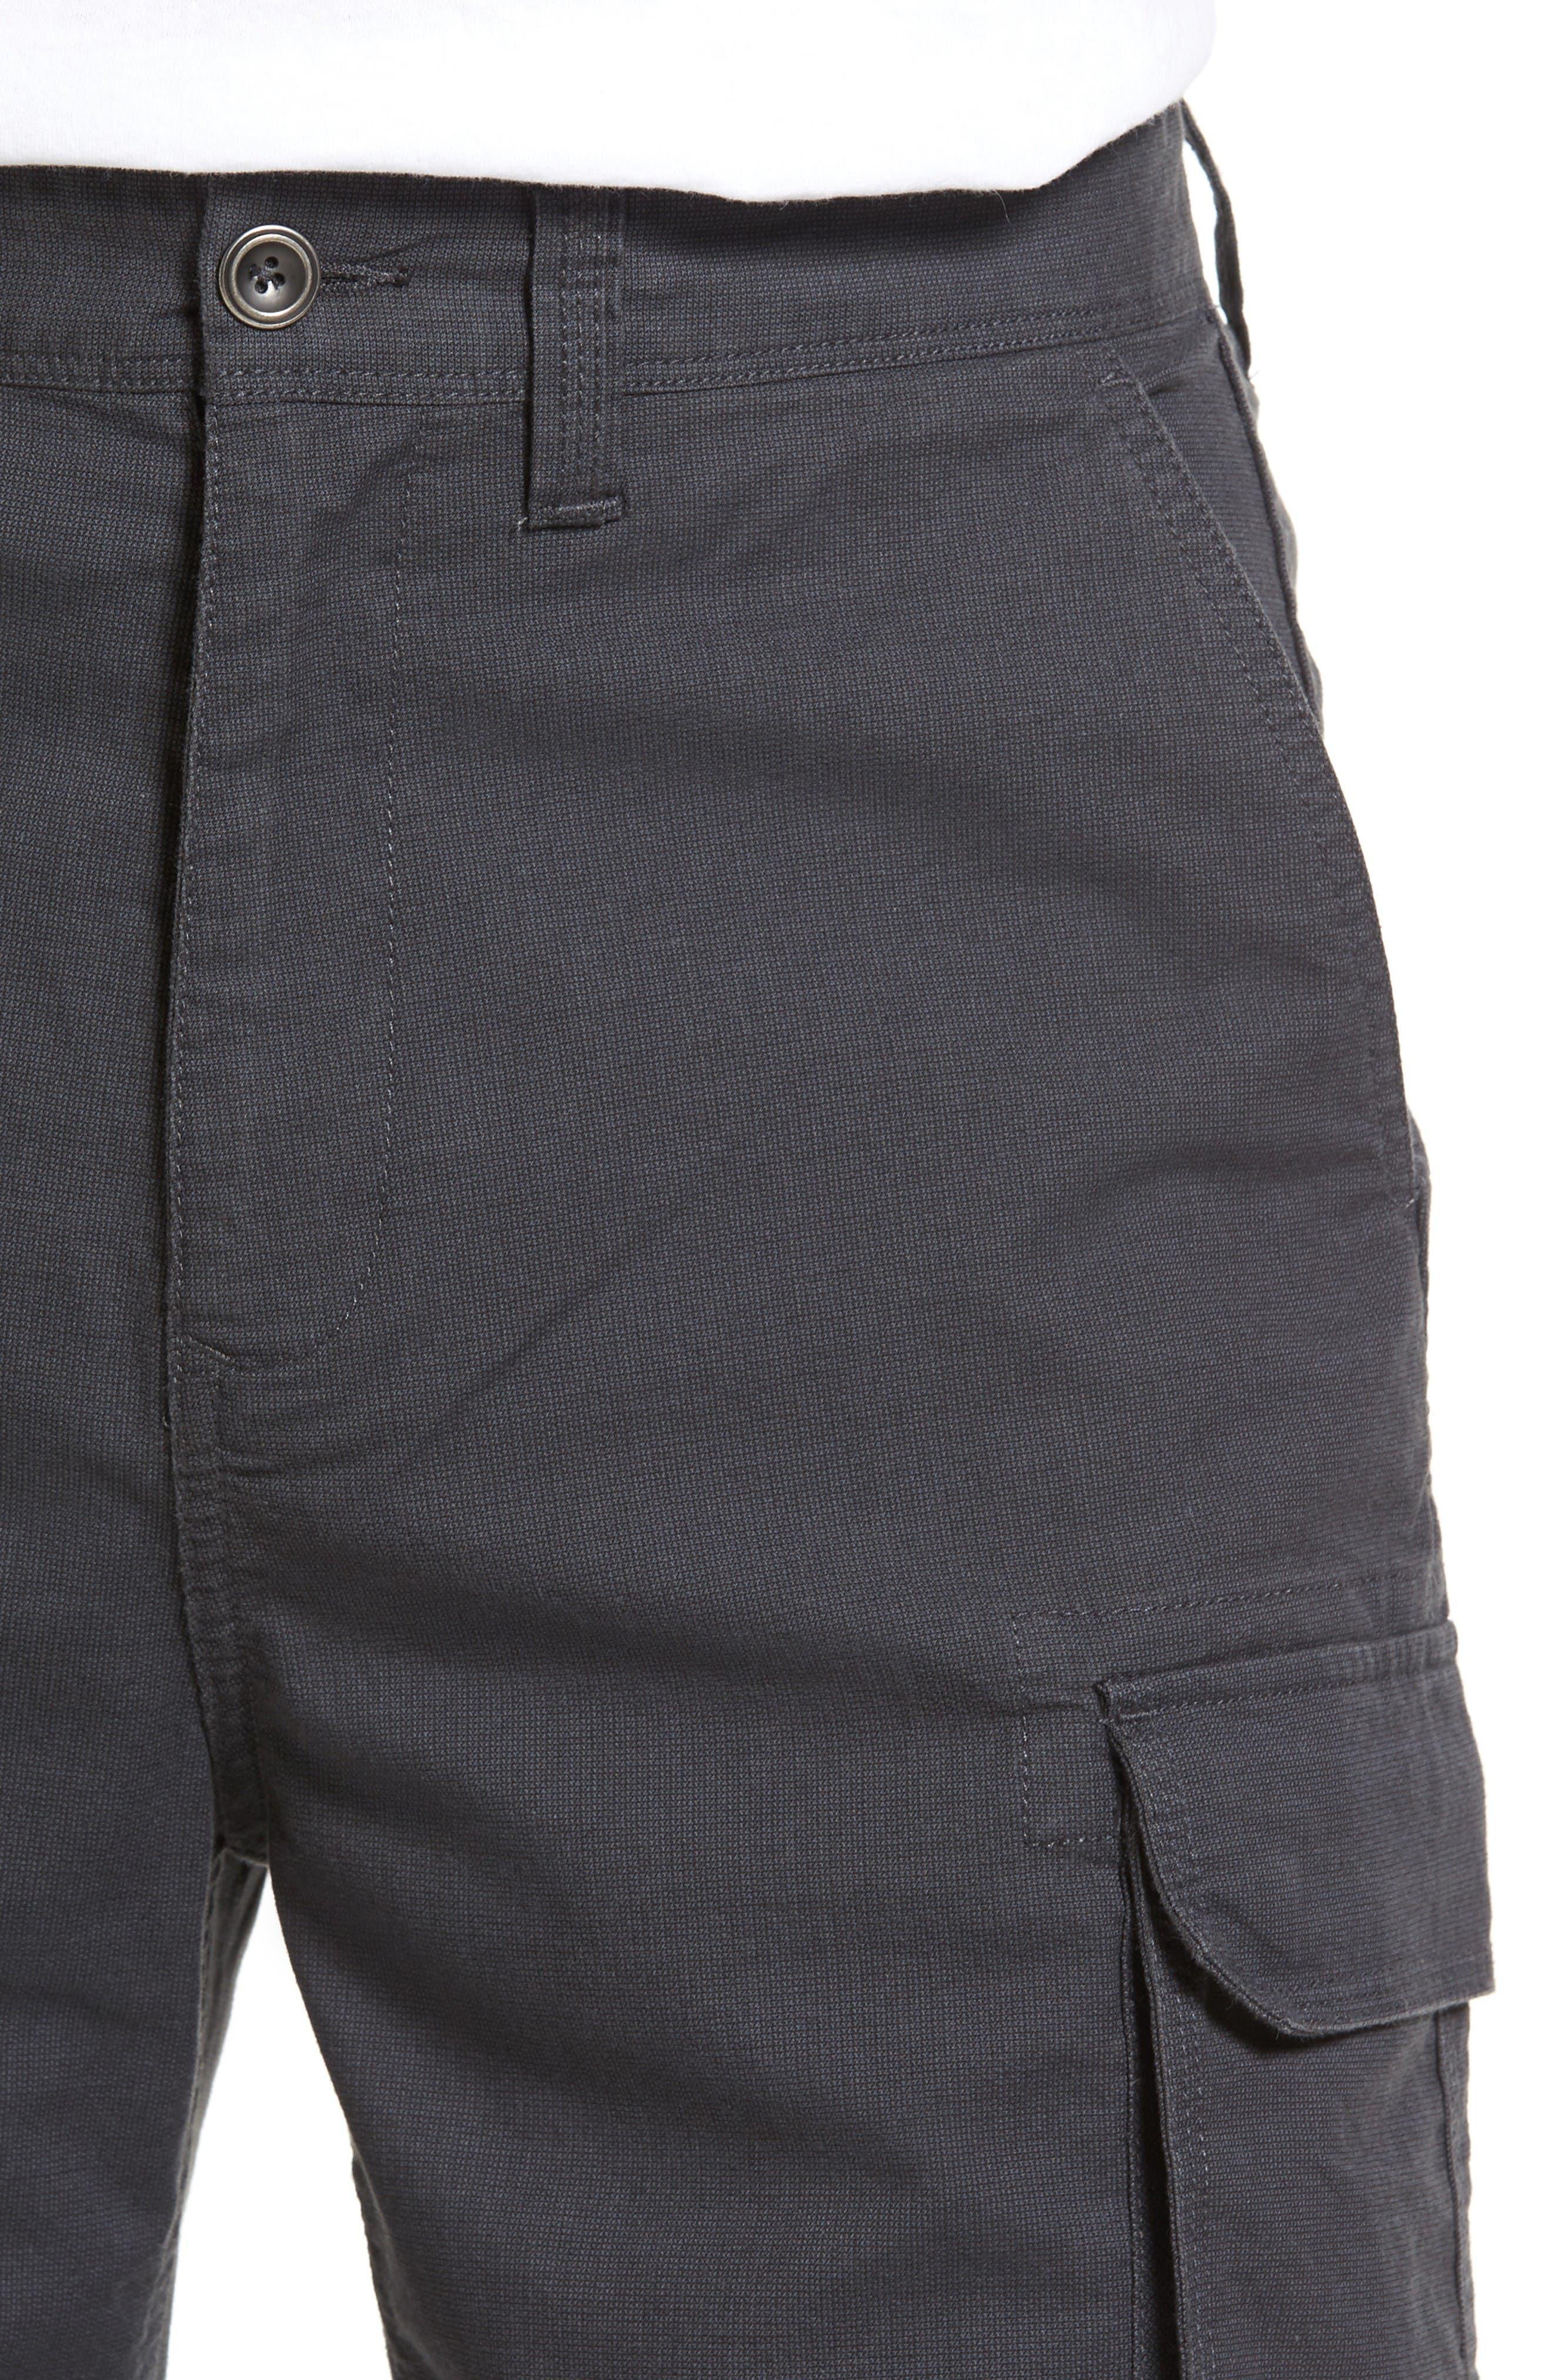 Ludstone Cargo Shorts,                             Alternate thumbnail 4, color,                             Blue Graphite